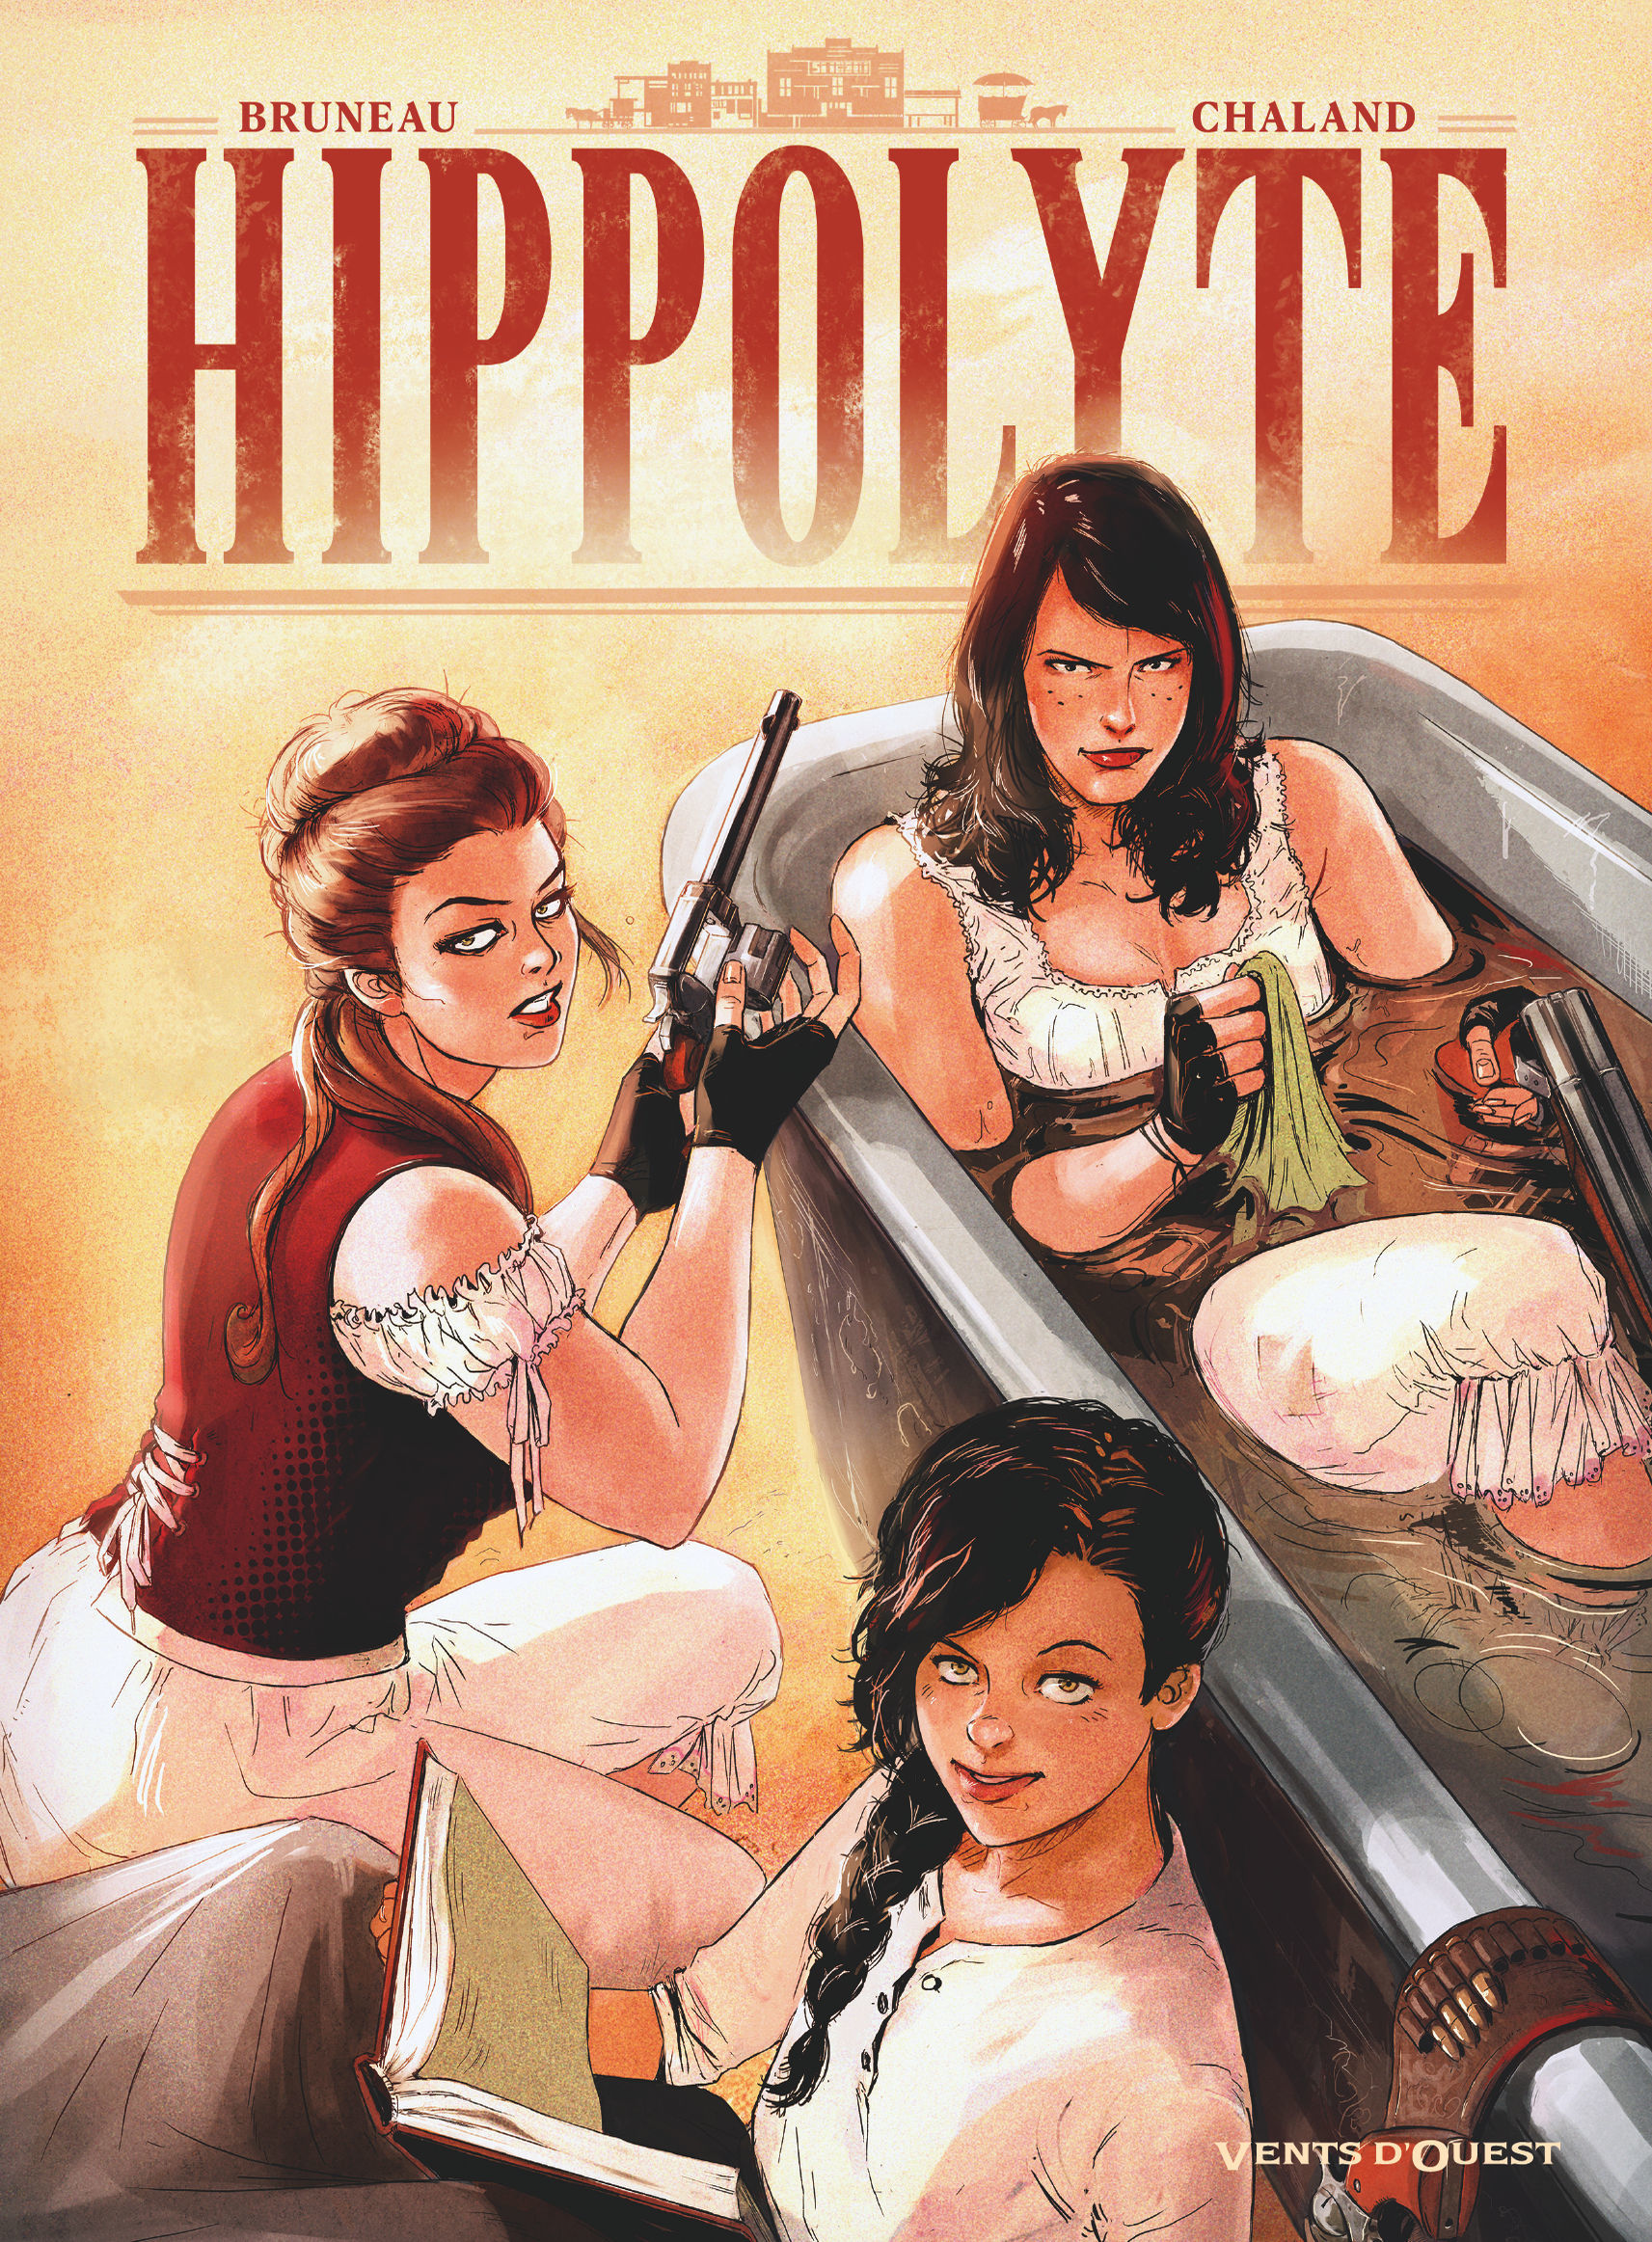 Hippolyte 1